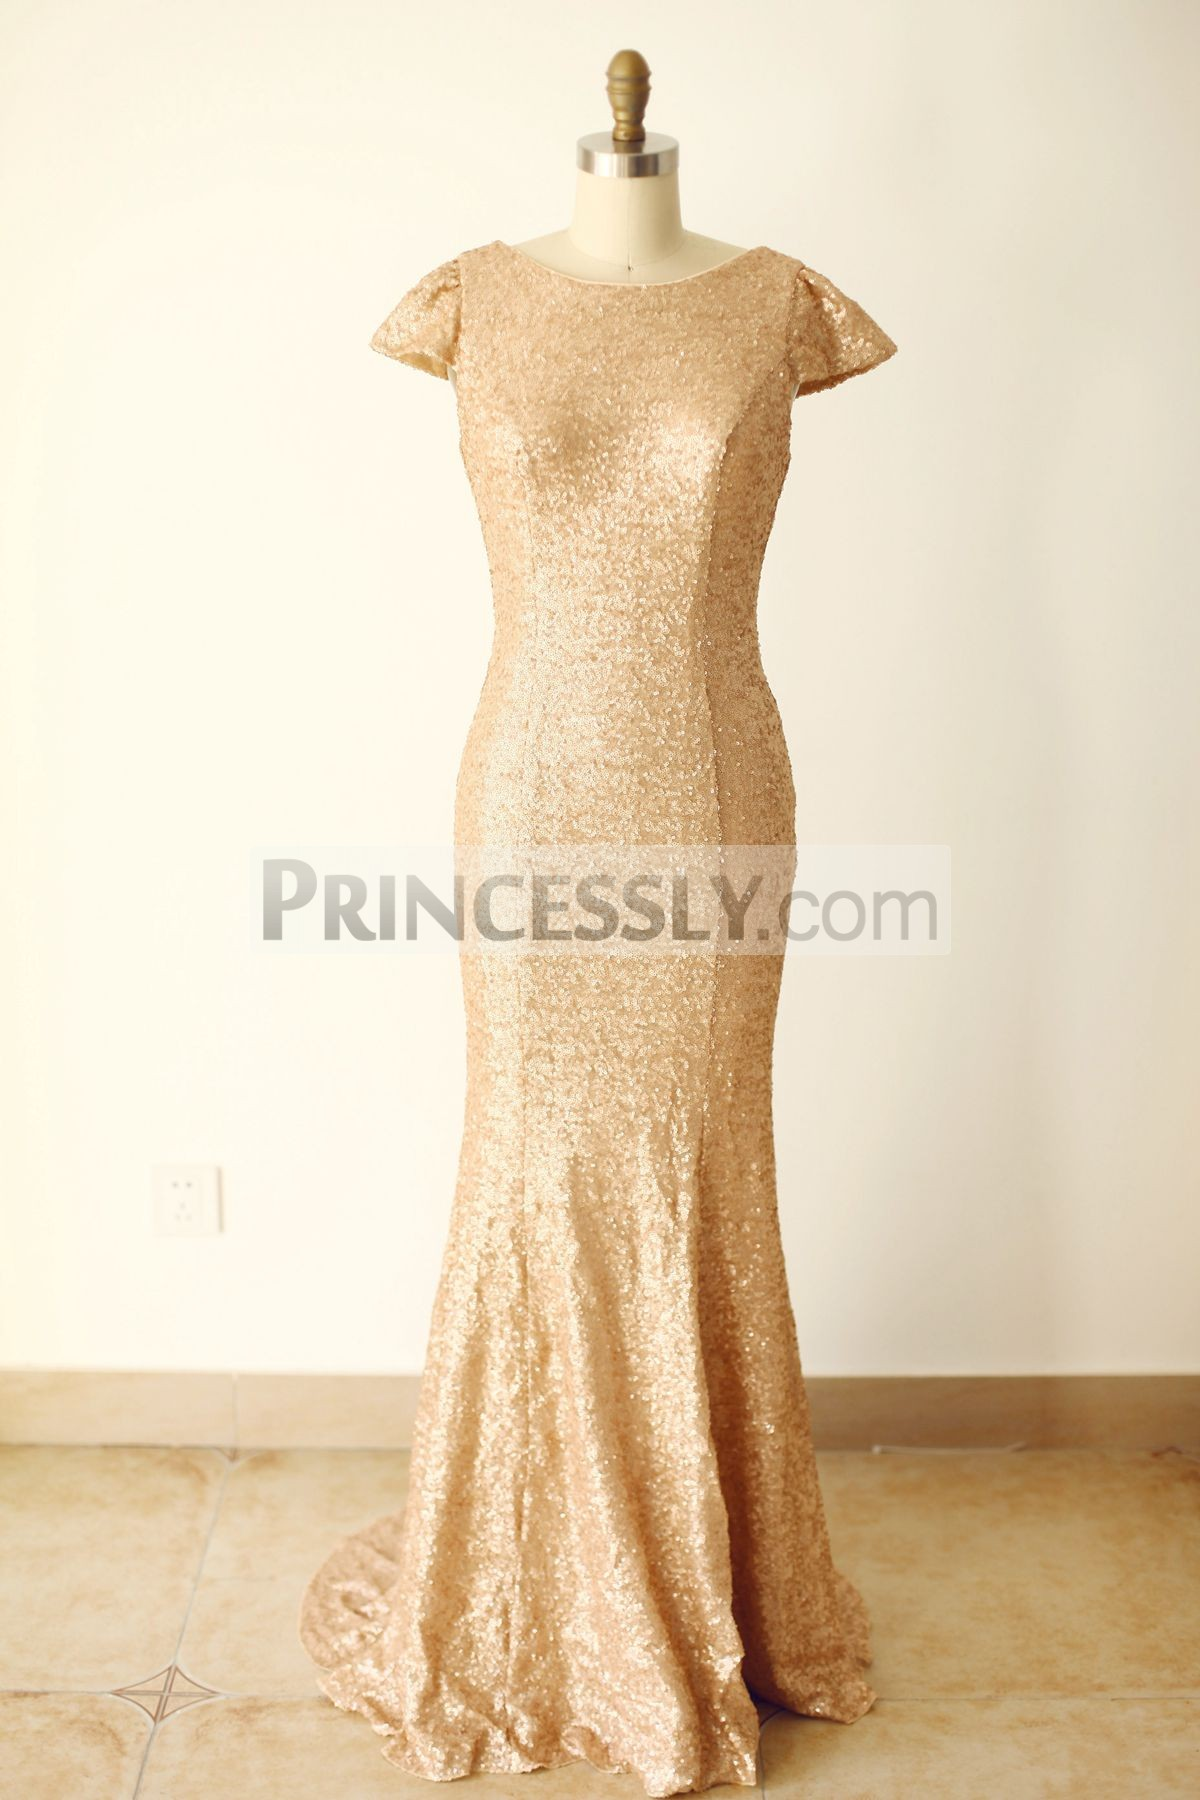 Princessly.com-K1000244-Cap Sleeves Champagne Gold Sequin V Back Long Wedding Bridesmaid Dress-31